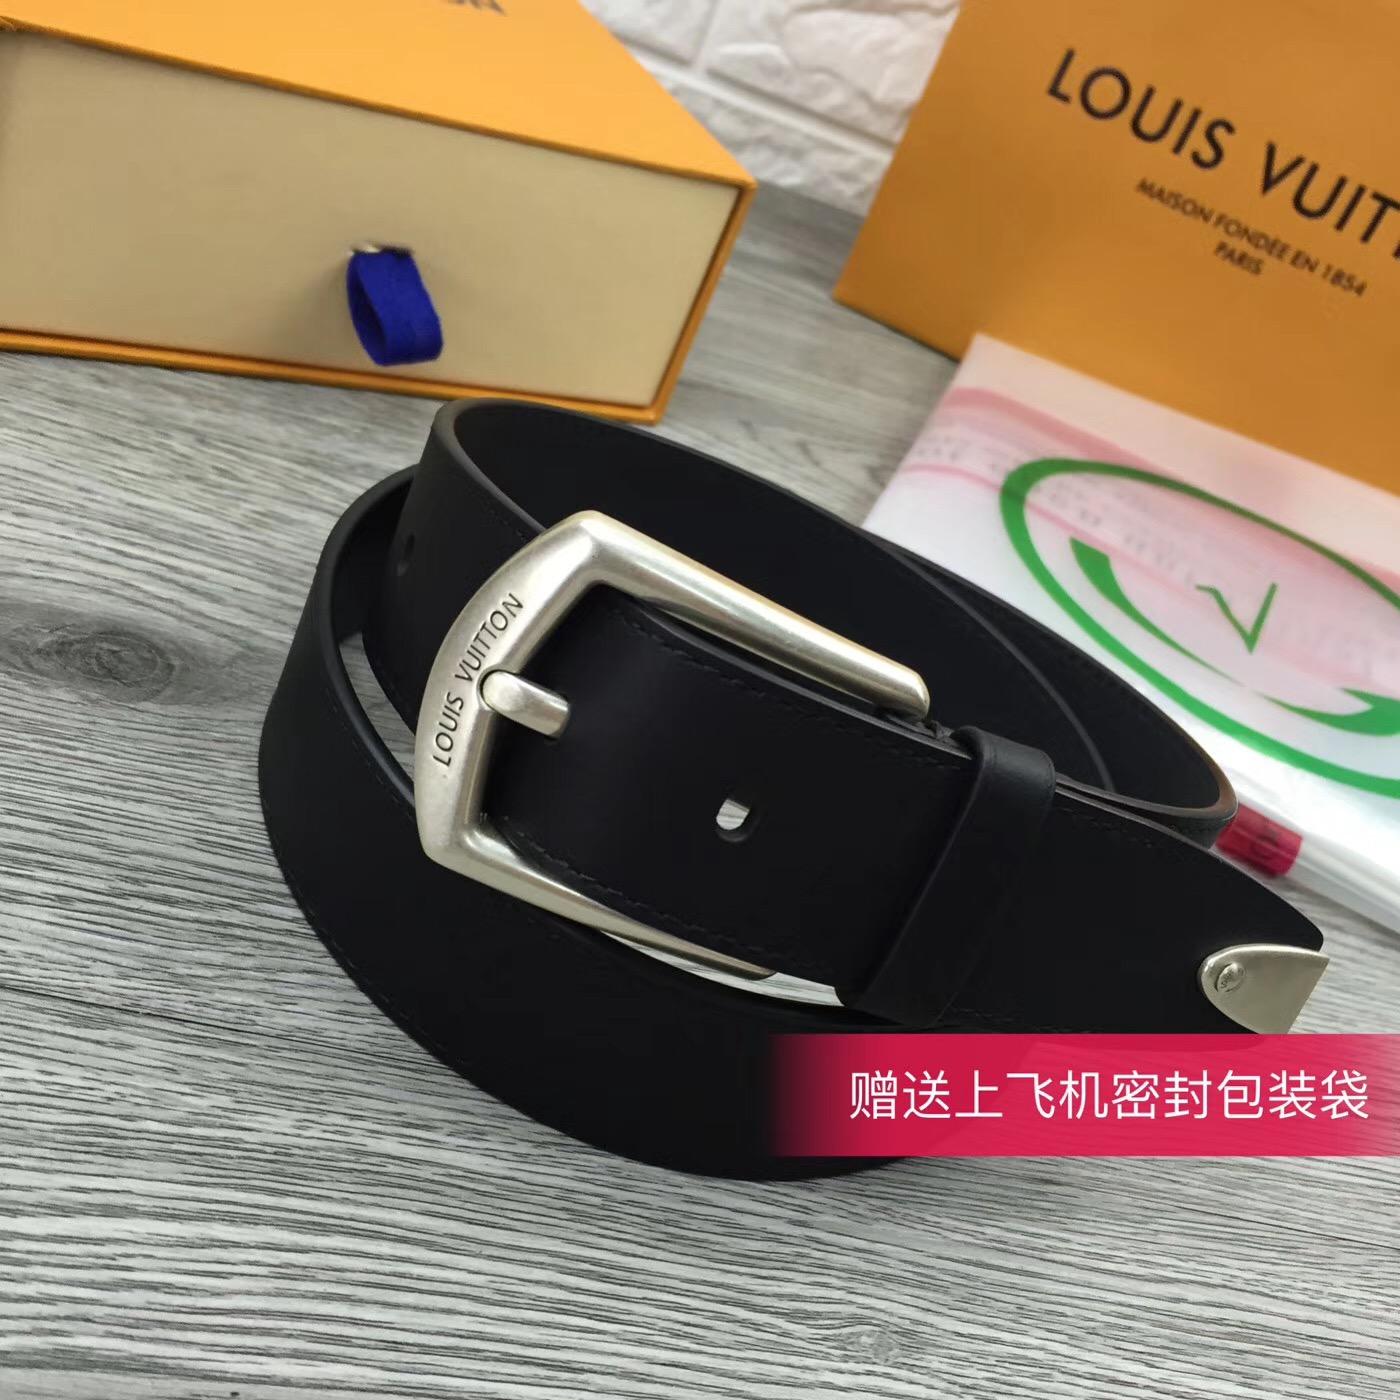 LOUIS VUITTON 腰帶 原單新品 專櫃有售 寬度3